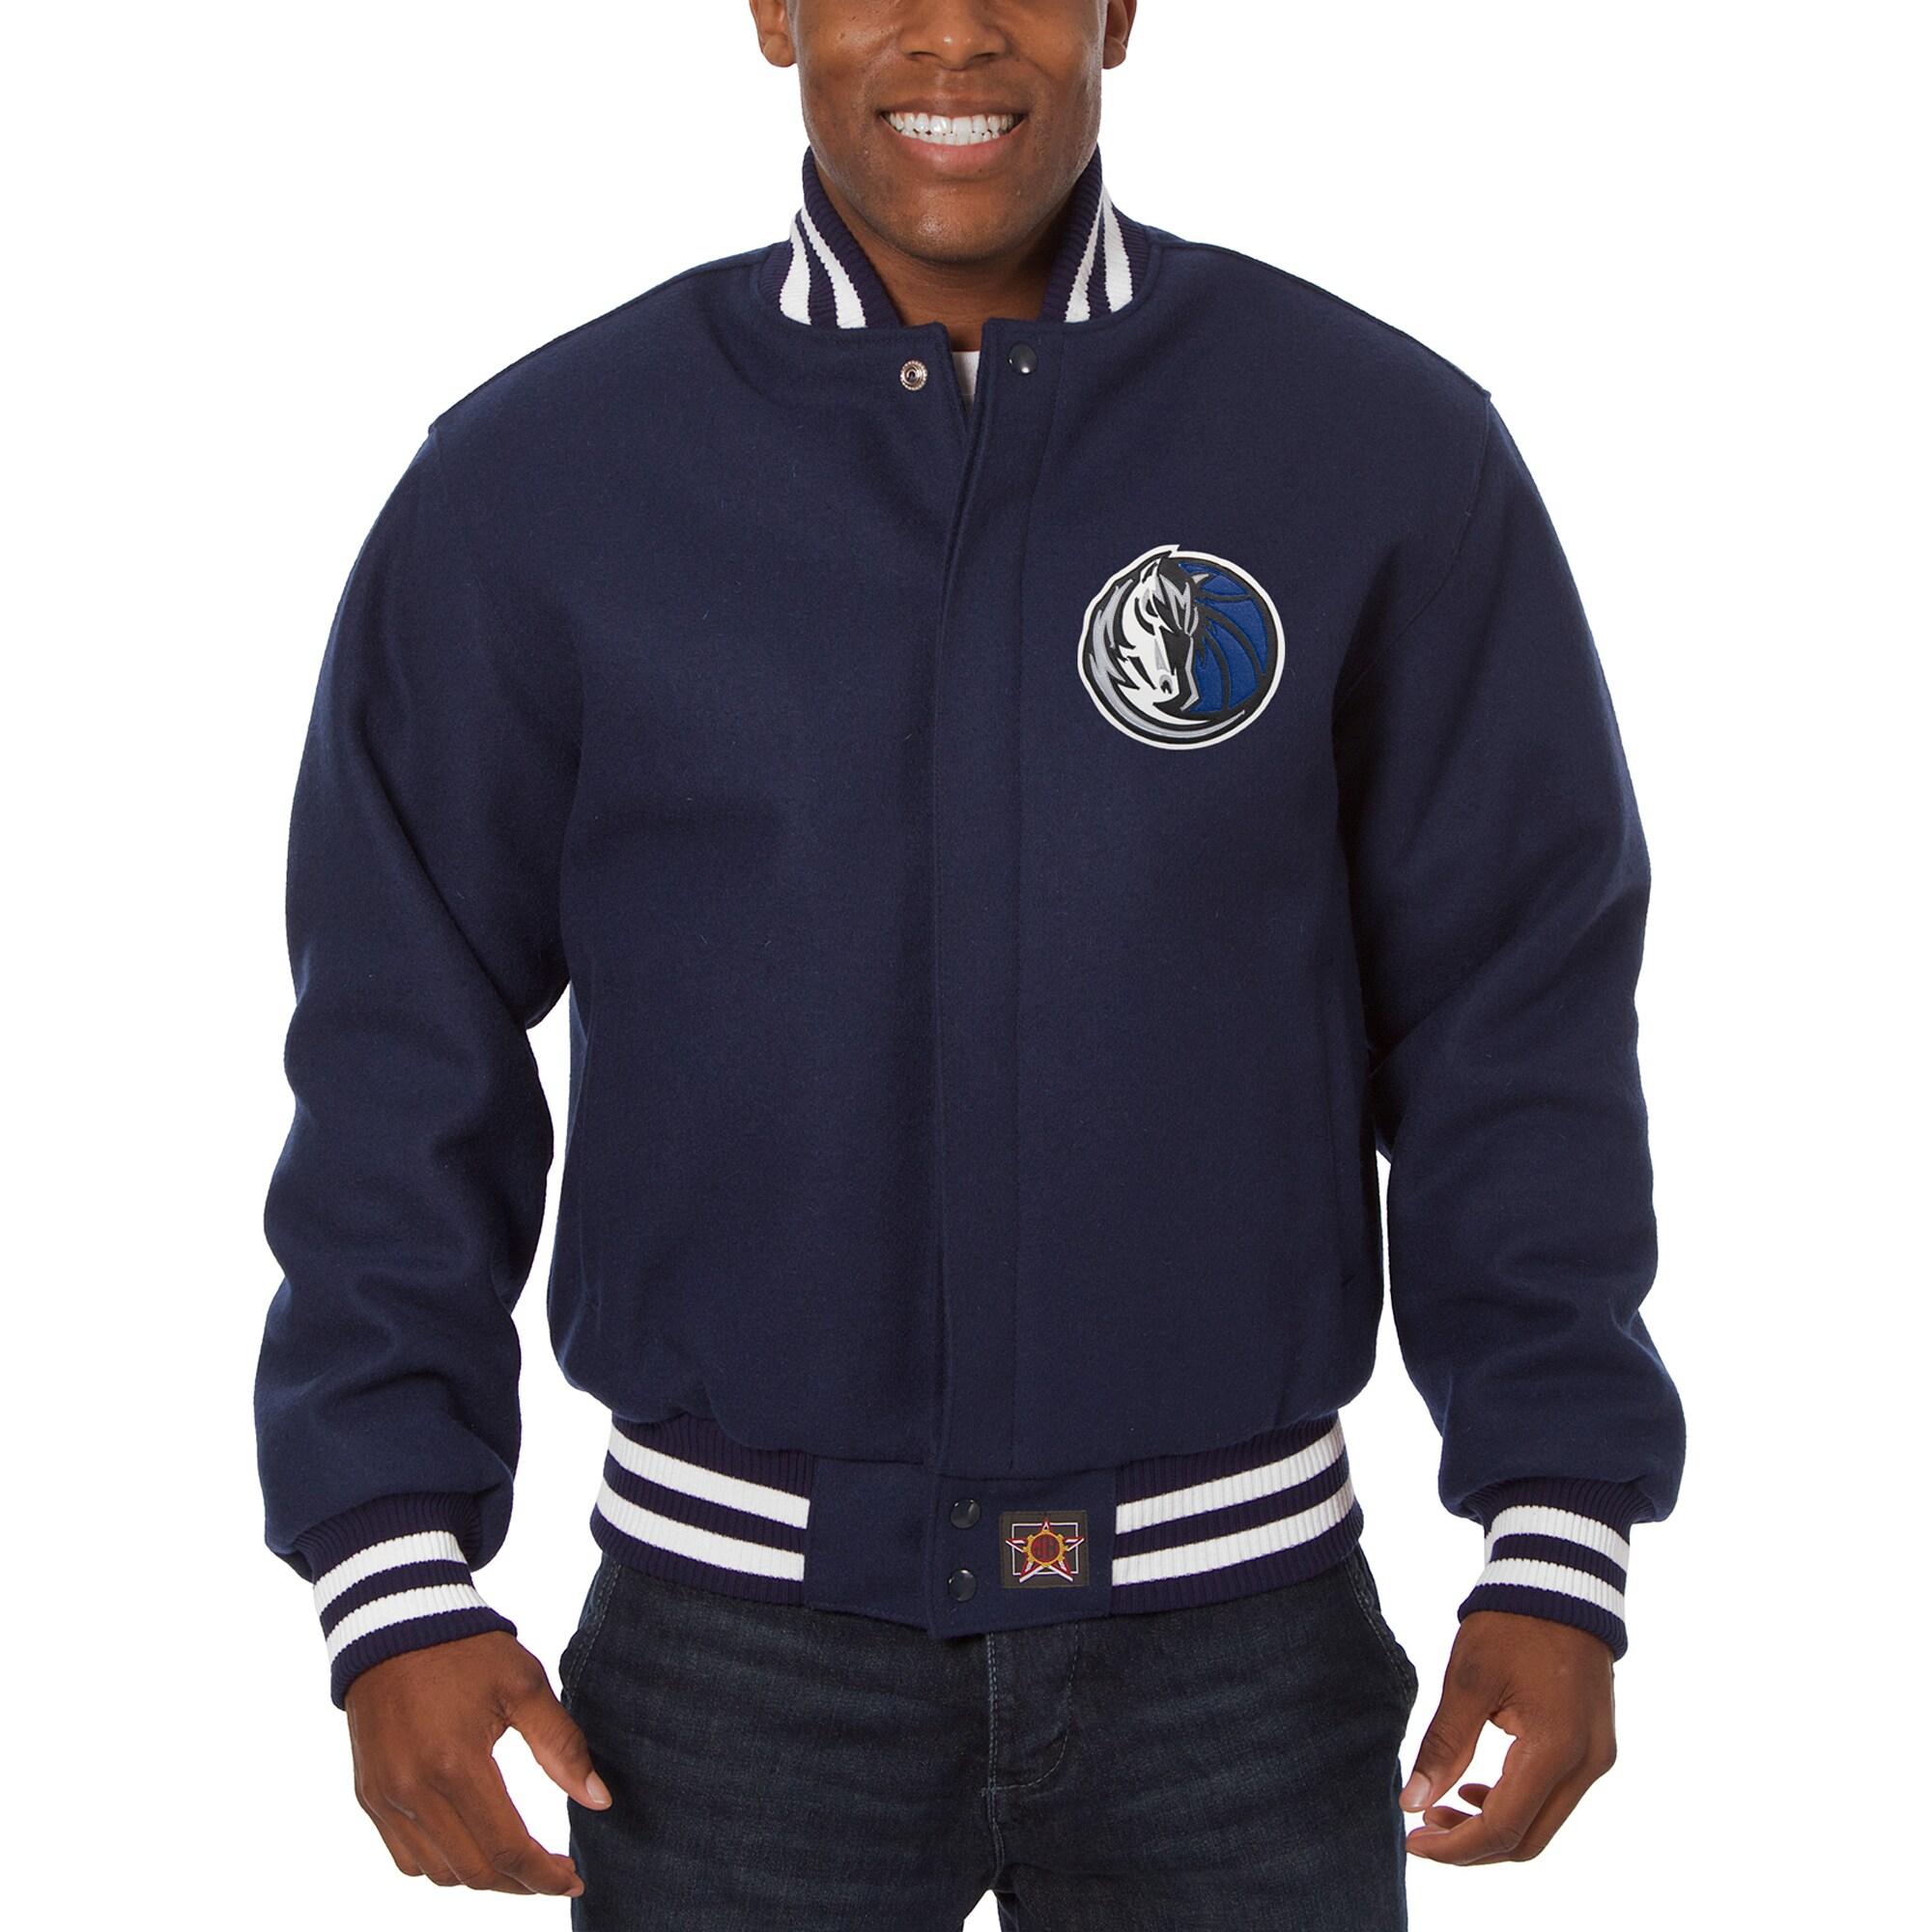 Dallas Mavericks JH Design Big & Tall All Wool Jacket with Leather Logo - Navy